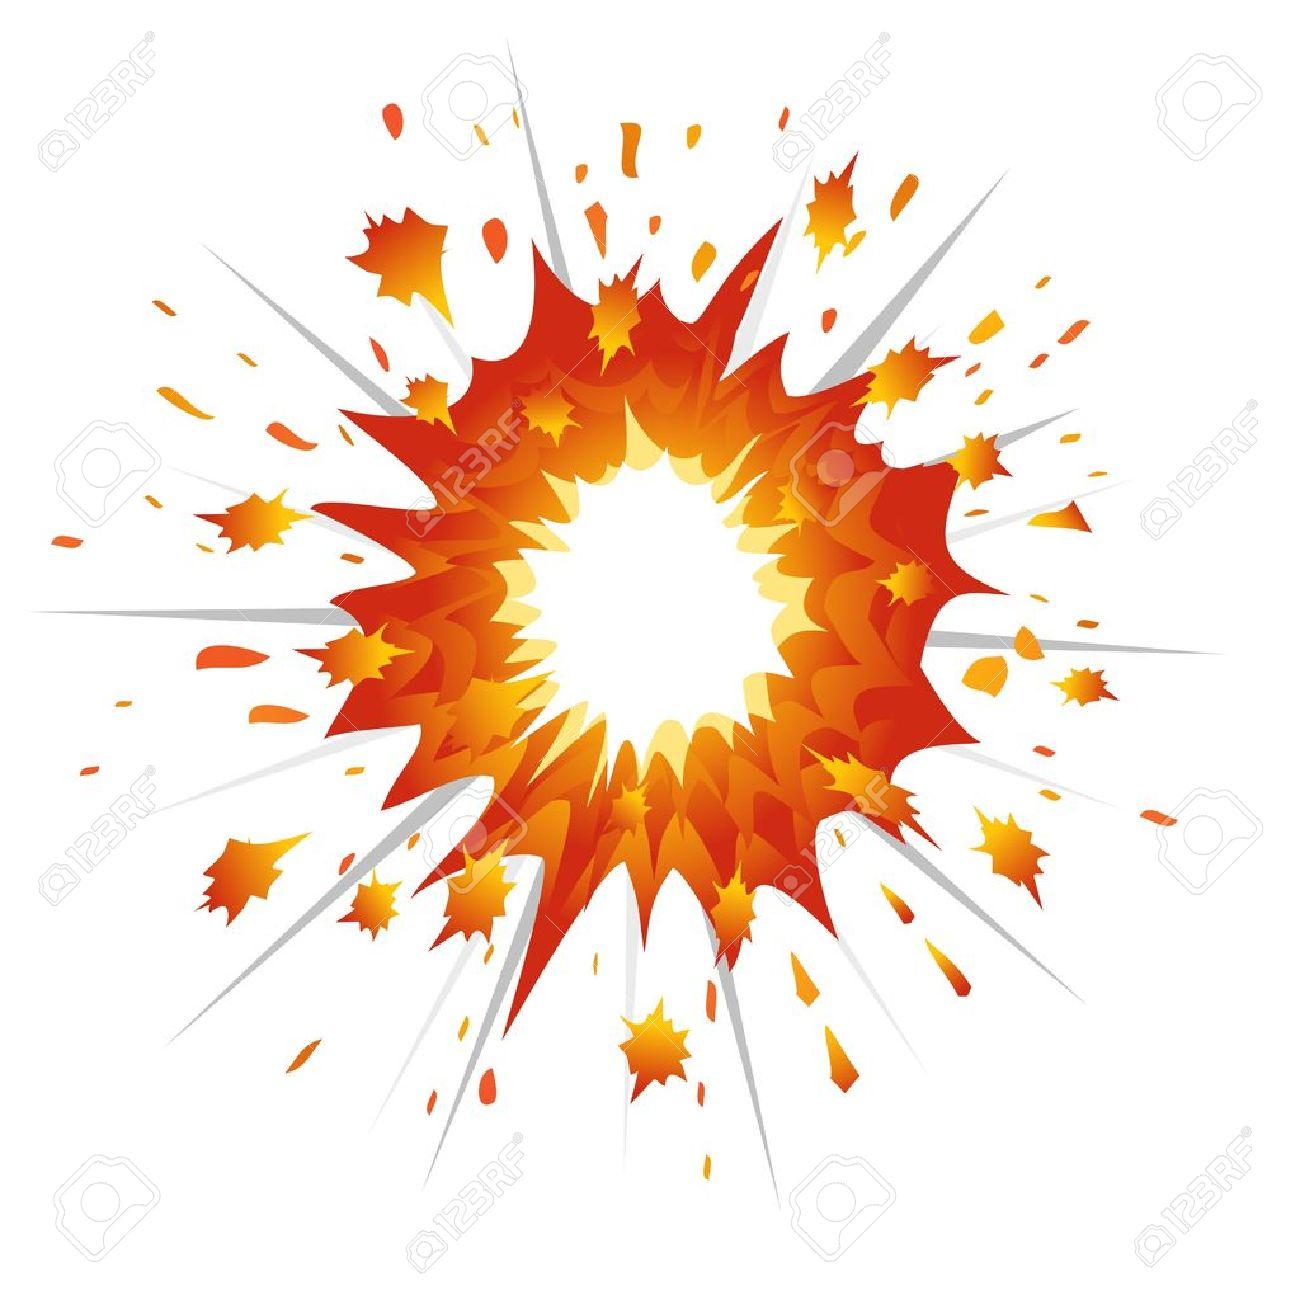 Explosion. Vector-Illustration Stock Vector - 11882377